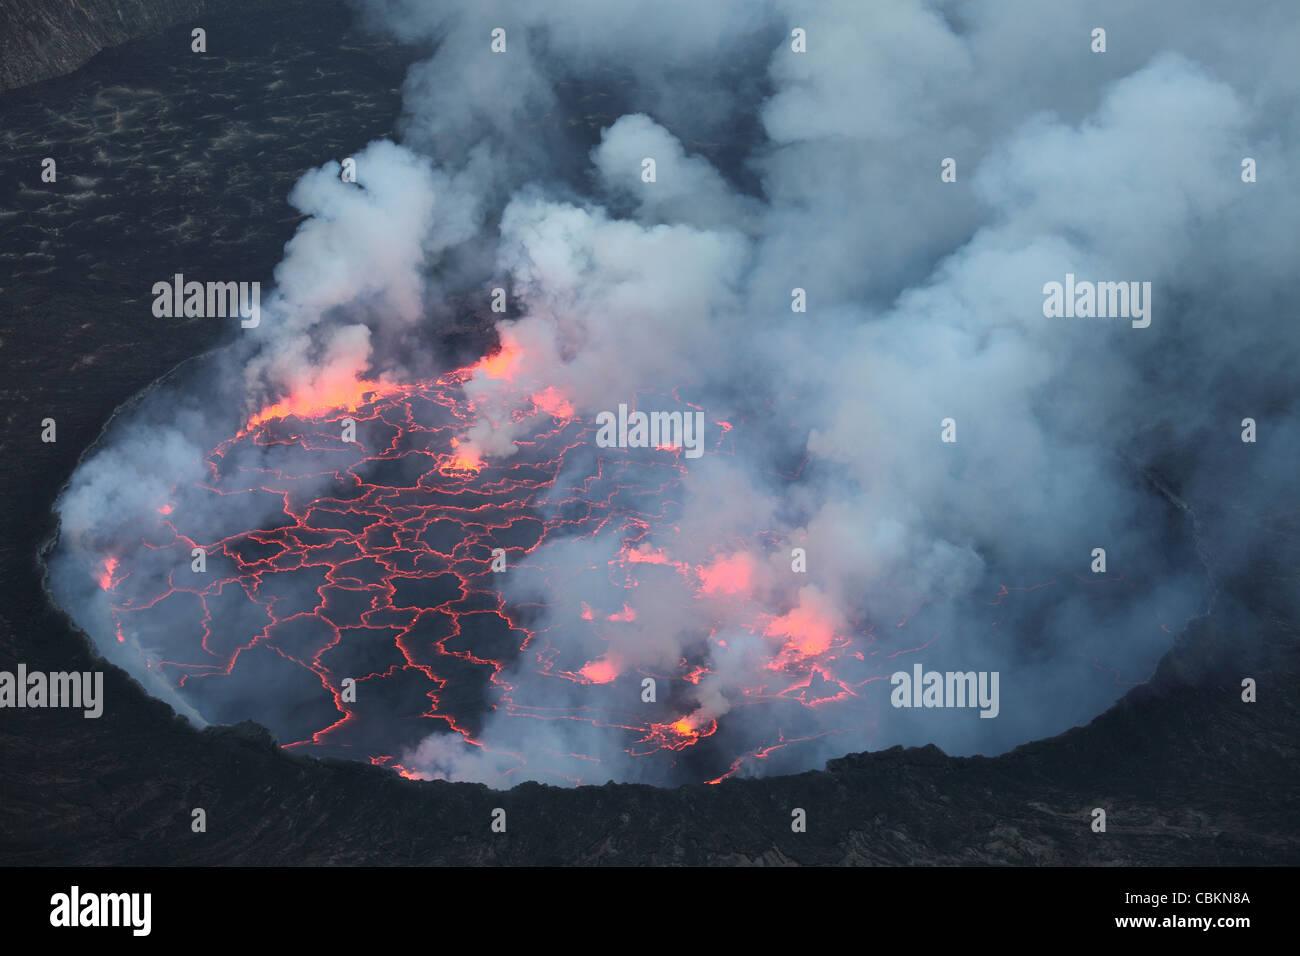 January 22, 2011 - Lava Lake with small lava fountains, Nyiragongo Volcano, Democratic Republic of the Congo. - Stock Image